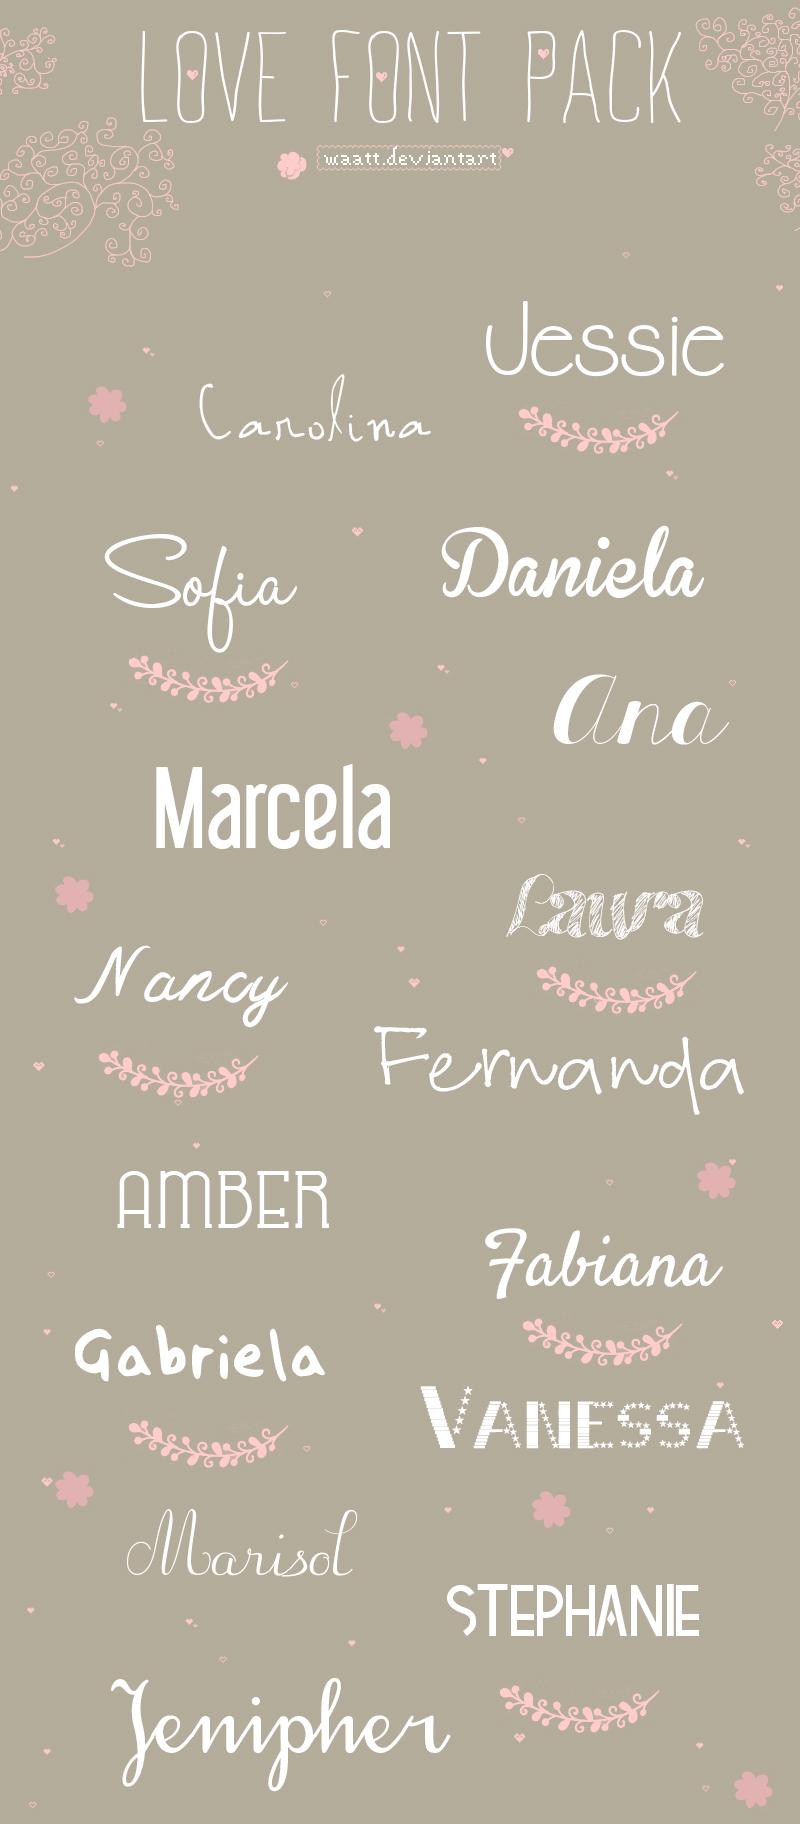 Download Lovely Fonts Pack by Waatt on DeviantArt